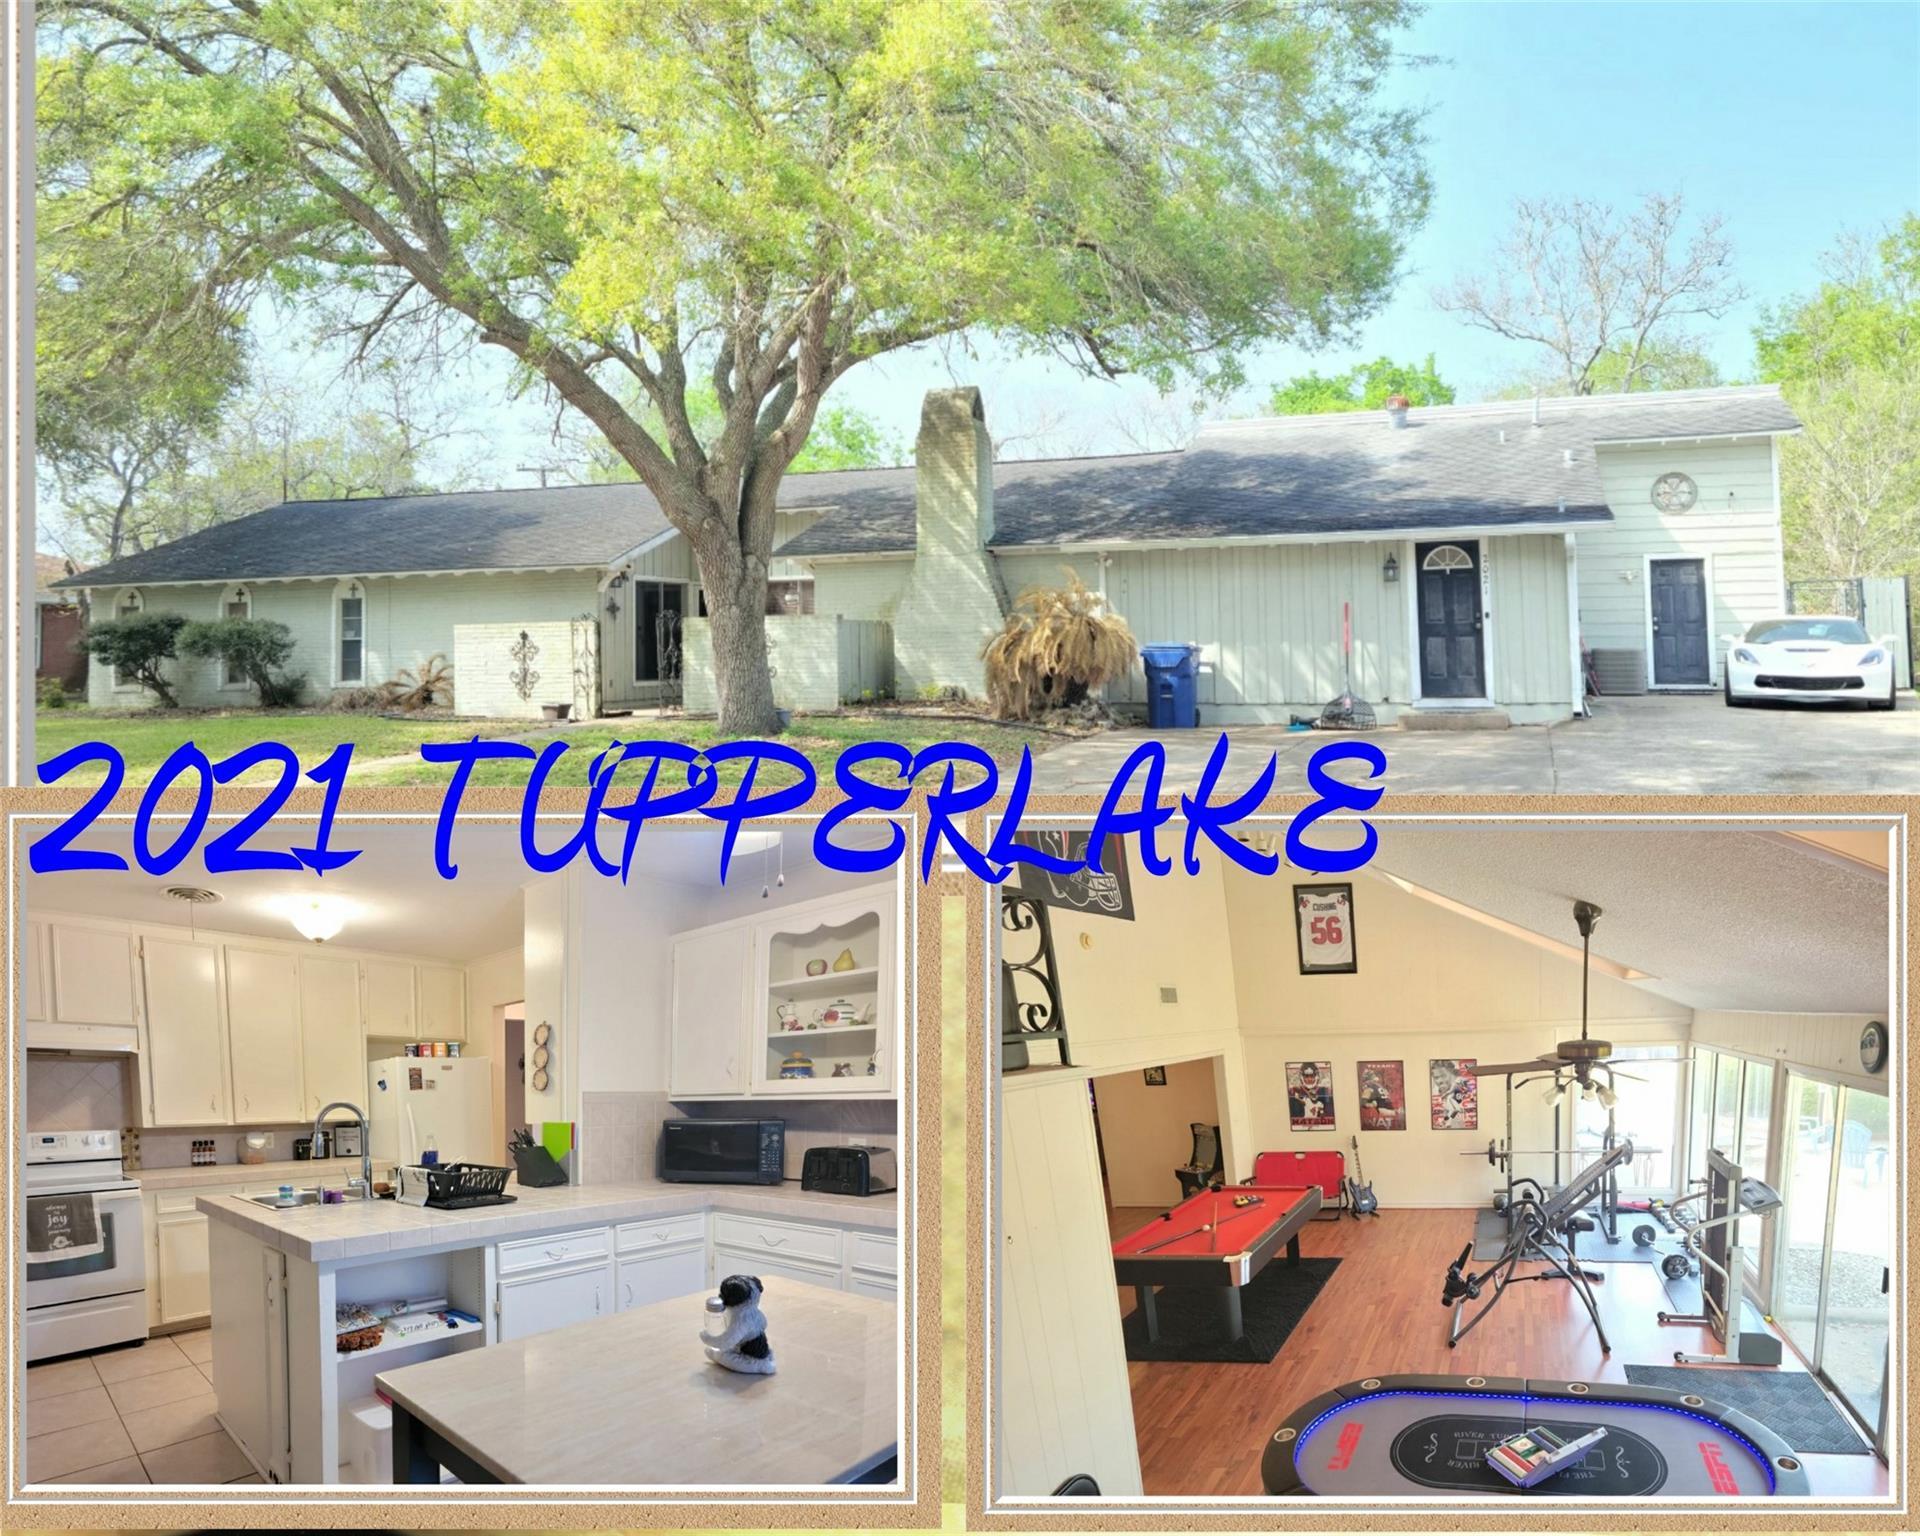 2021 Tupperlake Lane Property Photo - Bay City, TX real estate listing